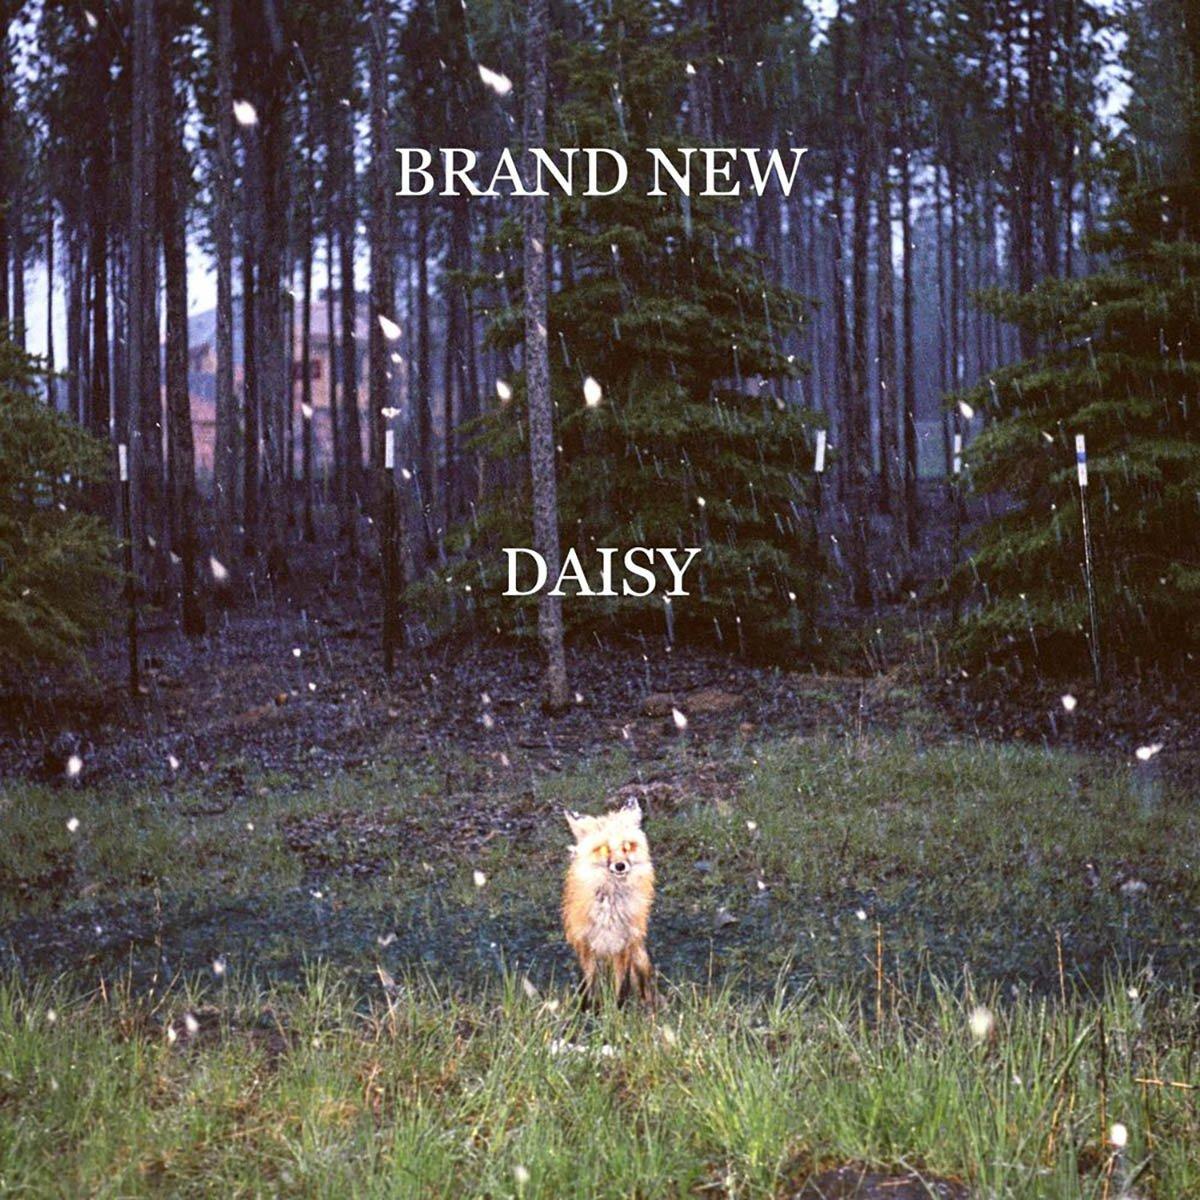 Brand New, Daisy